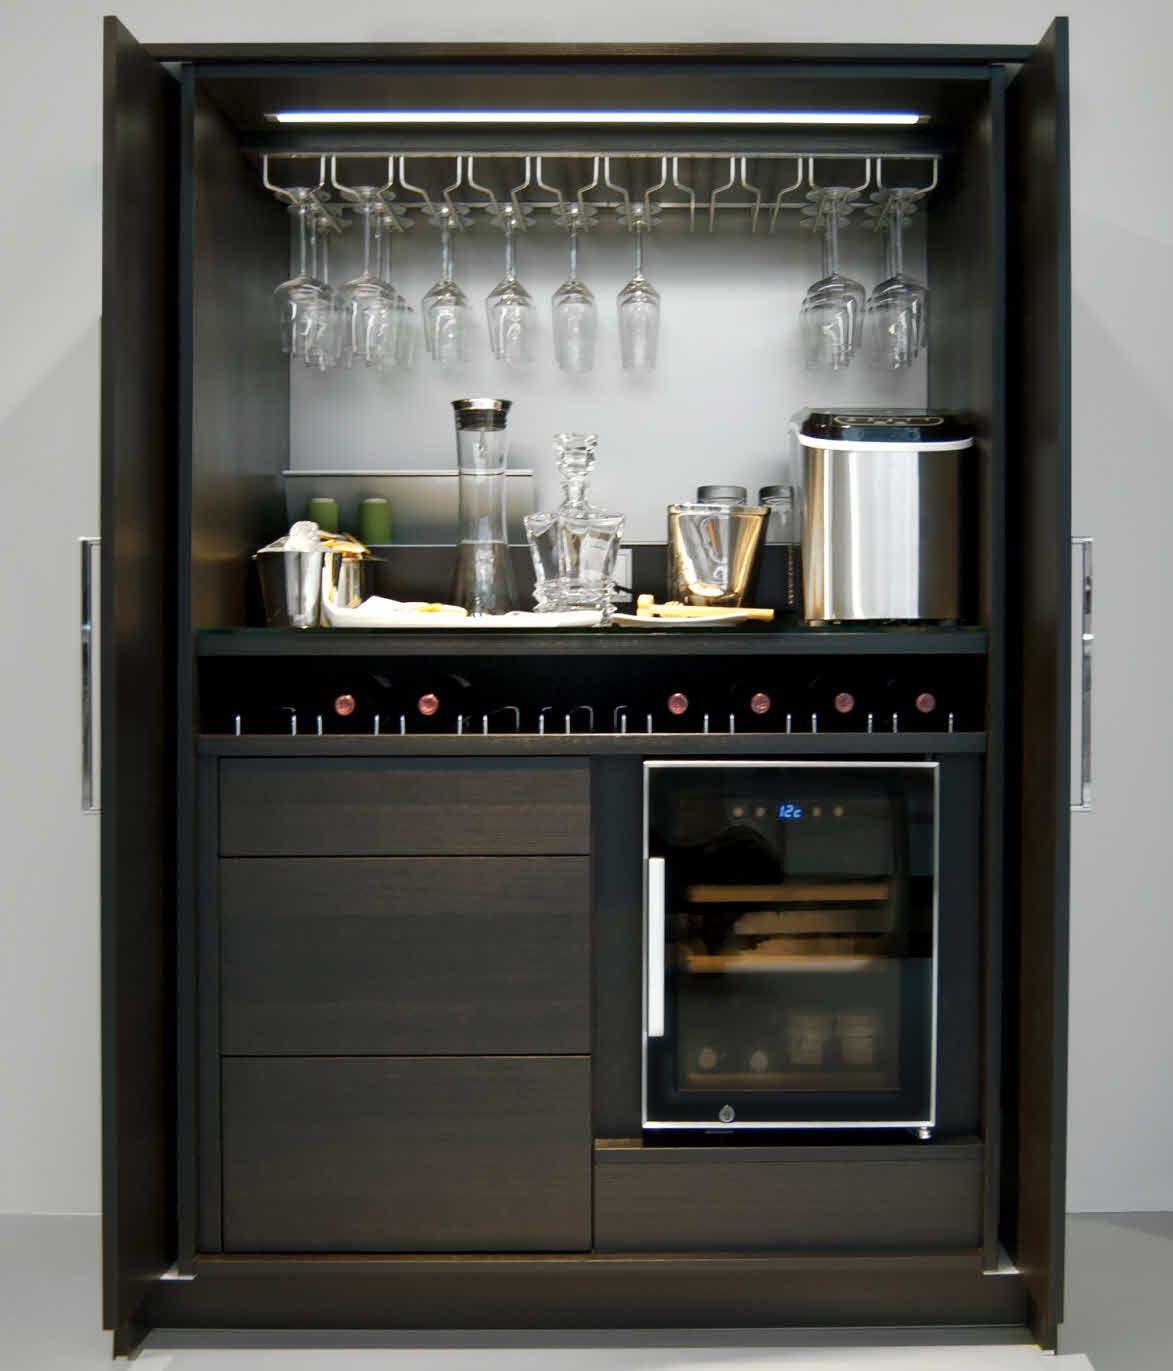 Pin de igra herrajes en estilo barra bar en 2019 for Mueble bar moderno para casa